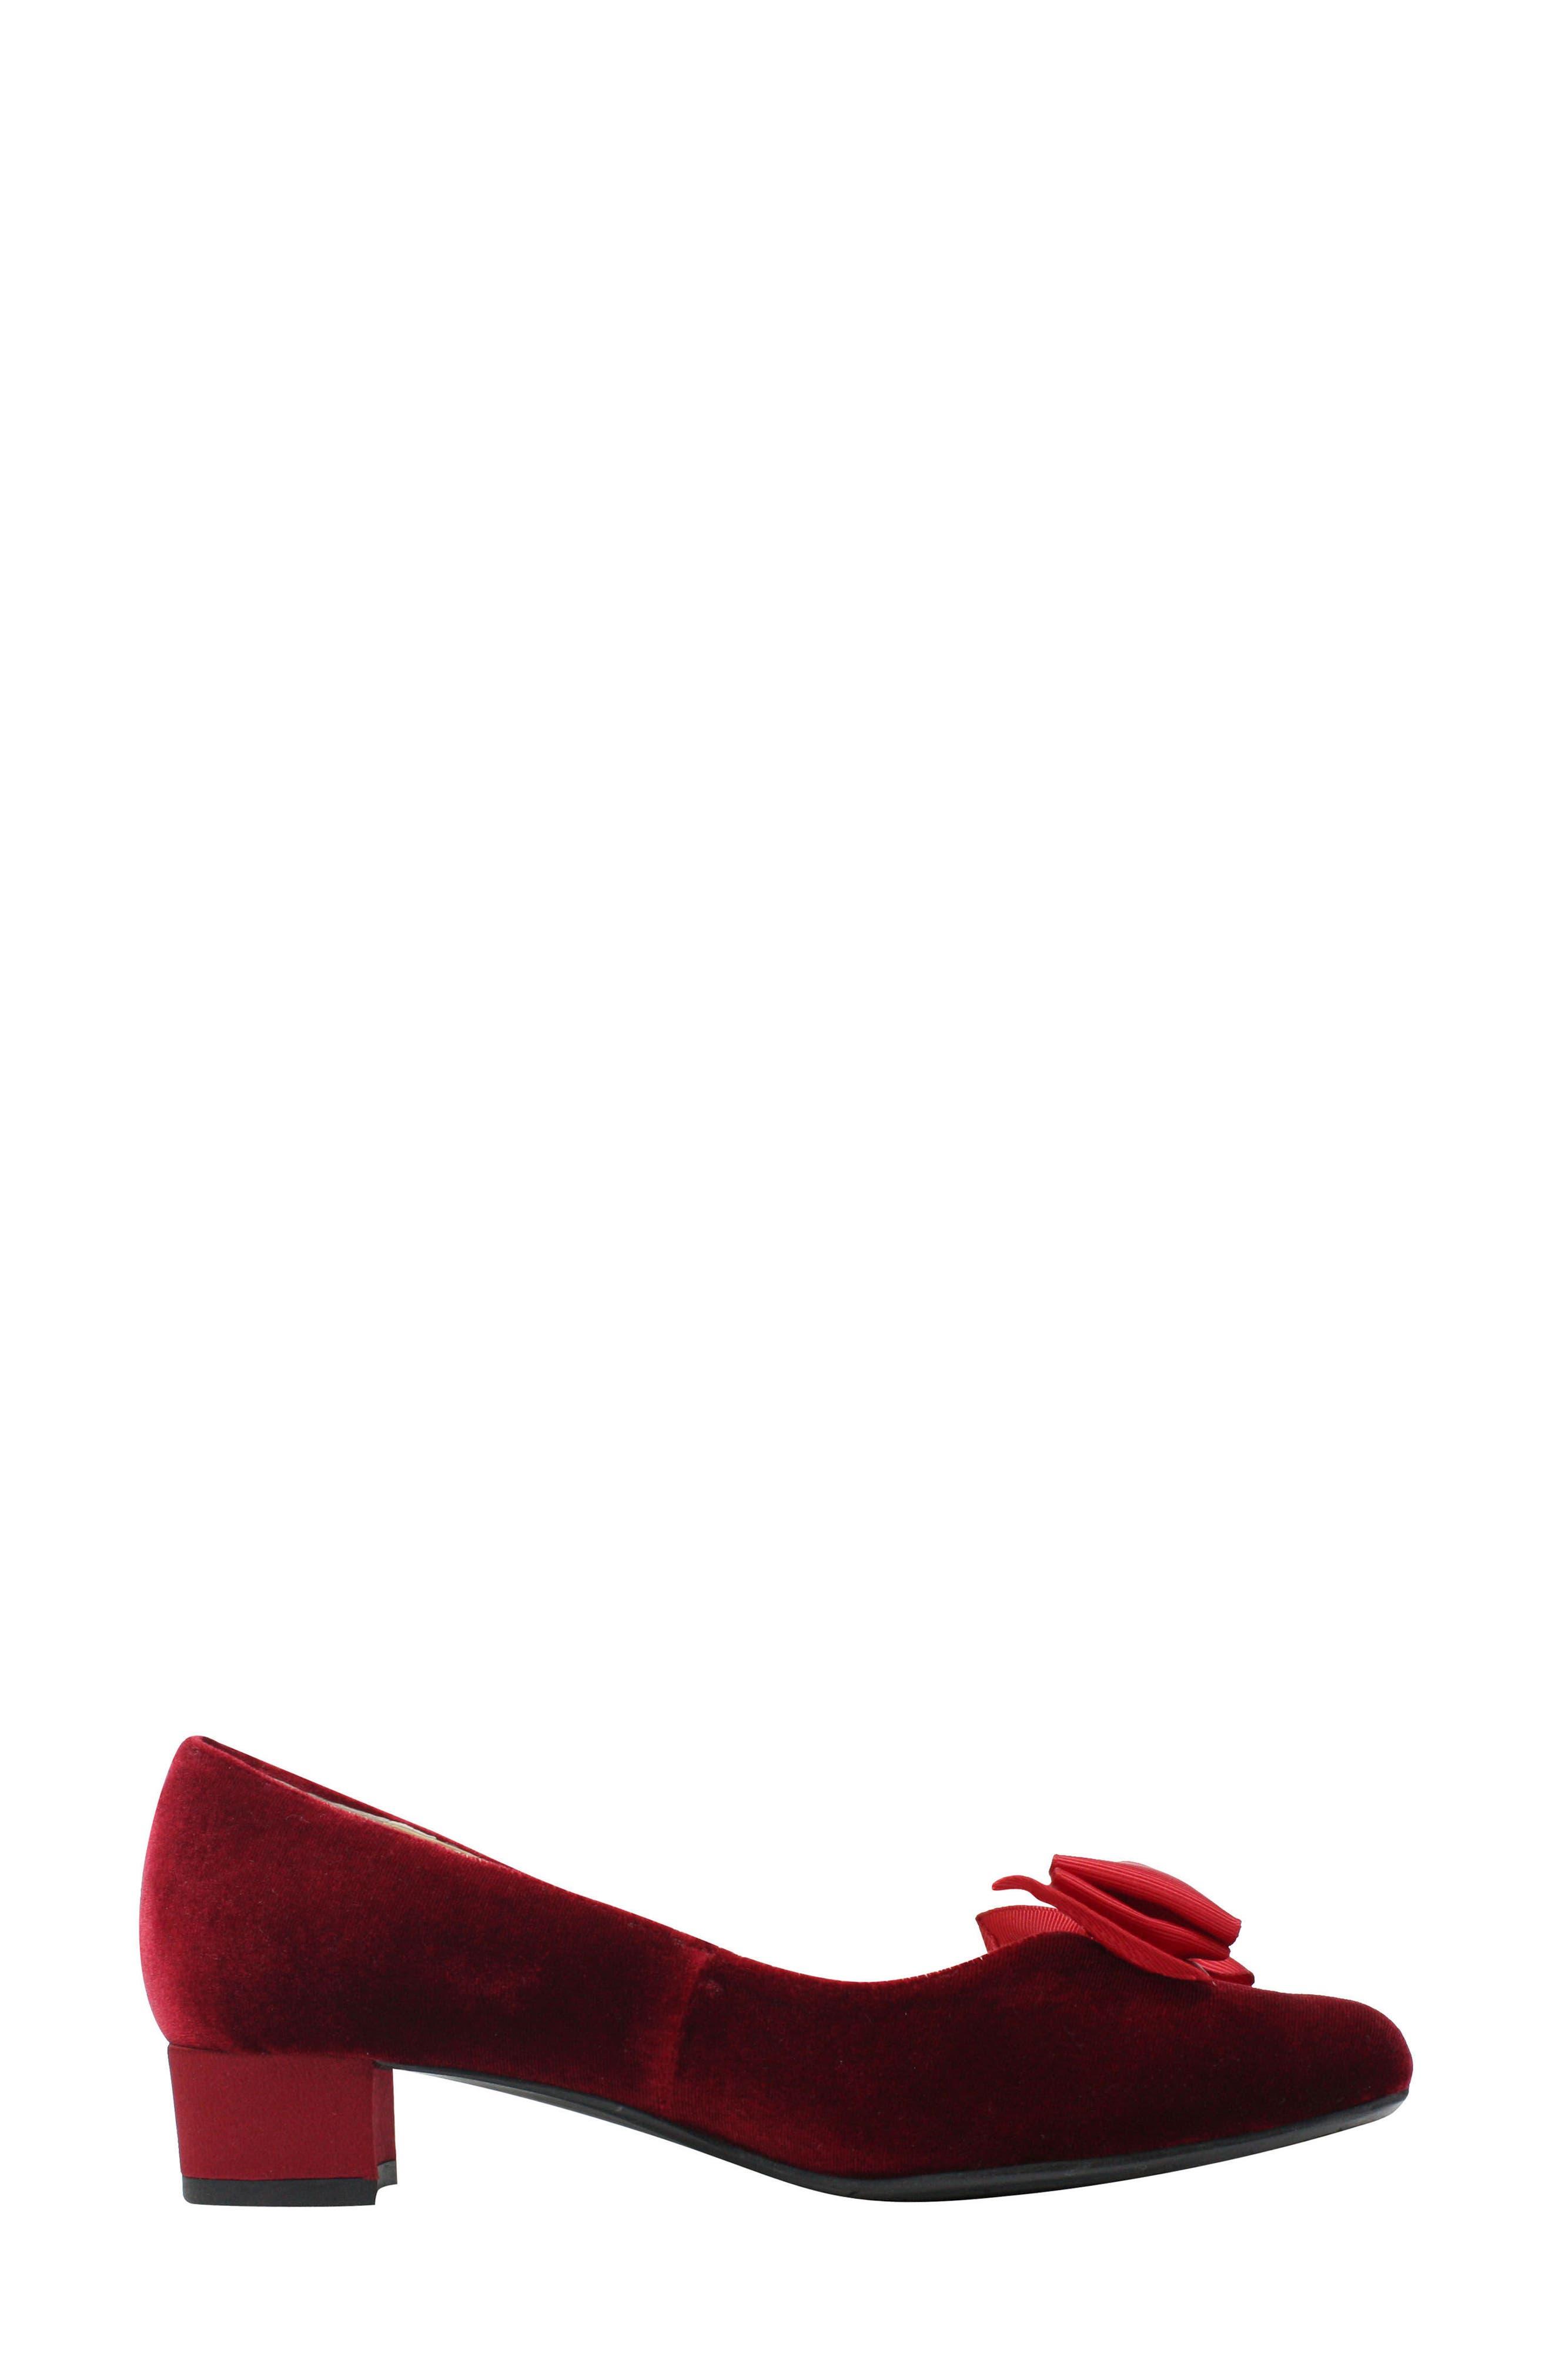 Cameo Bow Pump,                             Alternate thumbnail 3, color,                             Burgundy Velvet Fabric